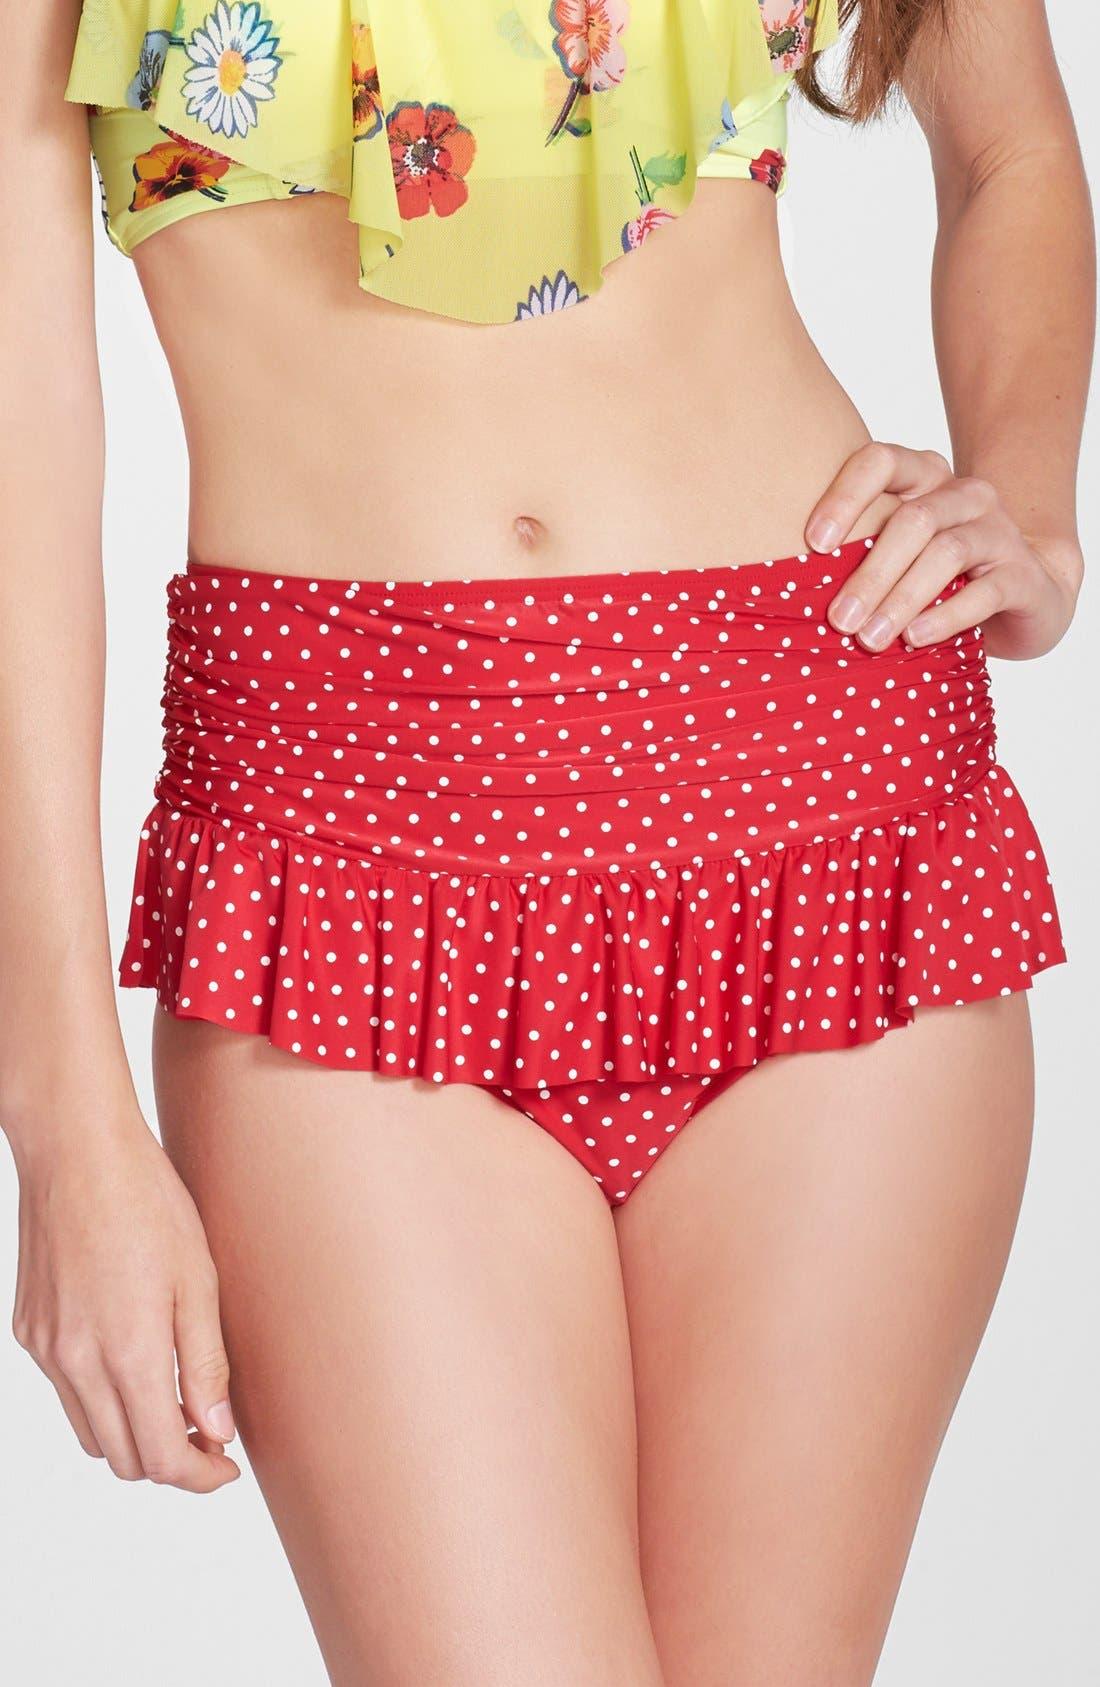 Alternate Image 1 Selected - Betsey Johnson 'Caroline No' Polka Dot High Waist Bikini Bottoms